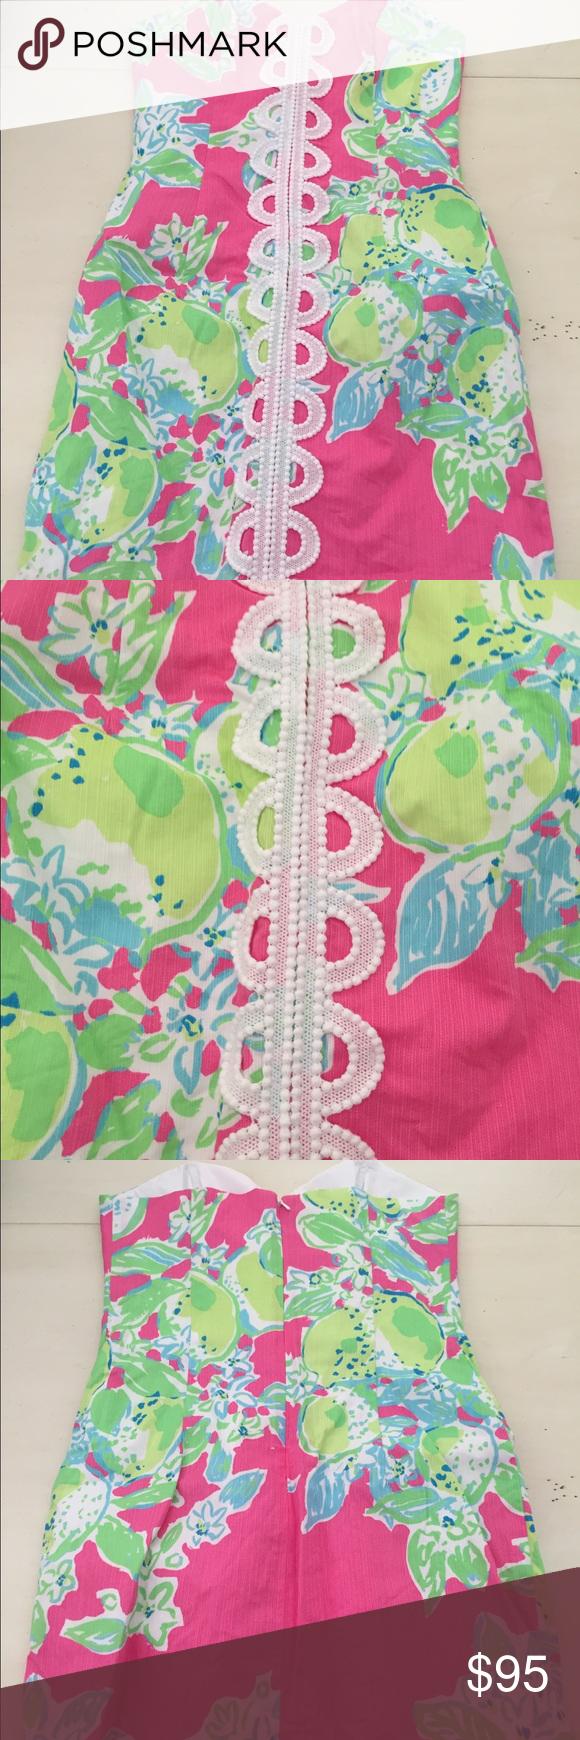 Lily strapless dress